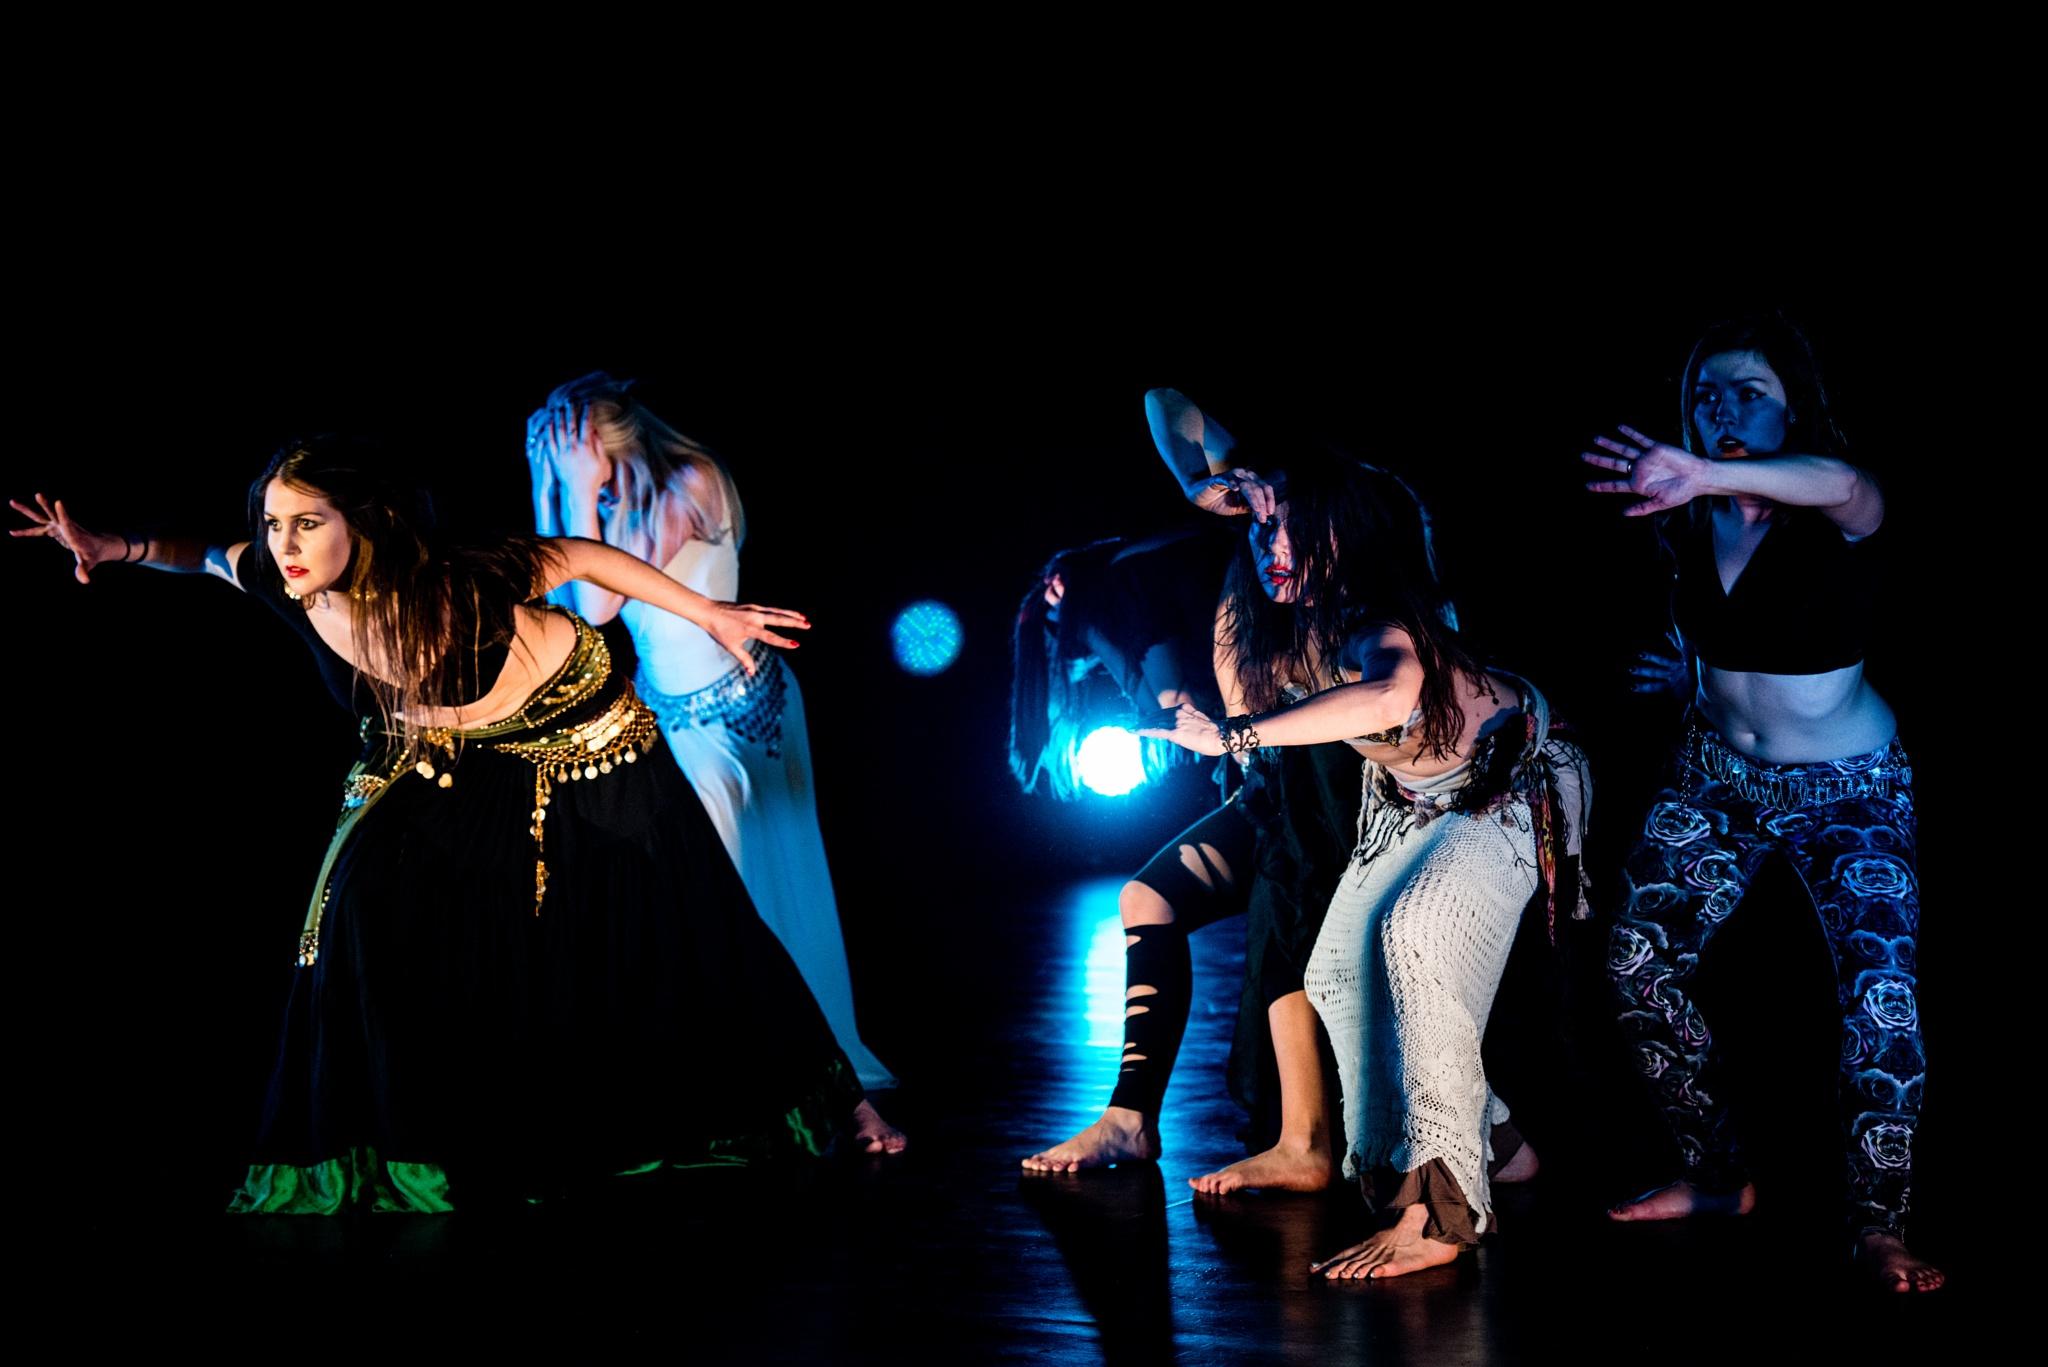 dance by lars-goran6